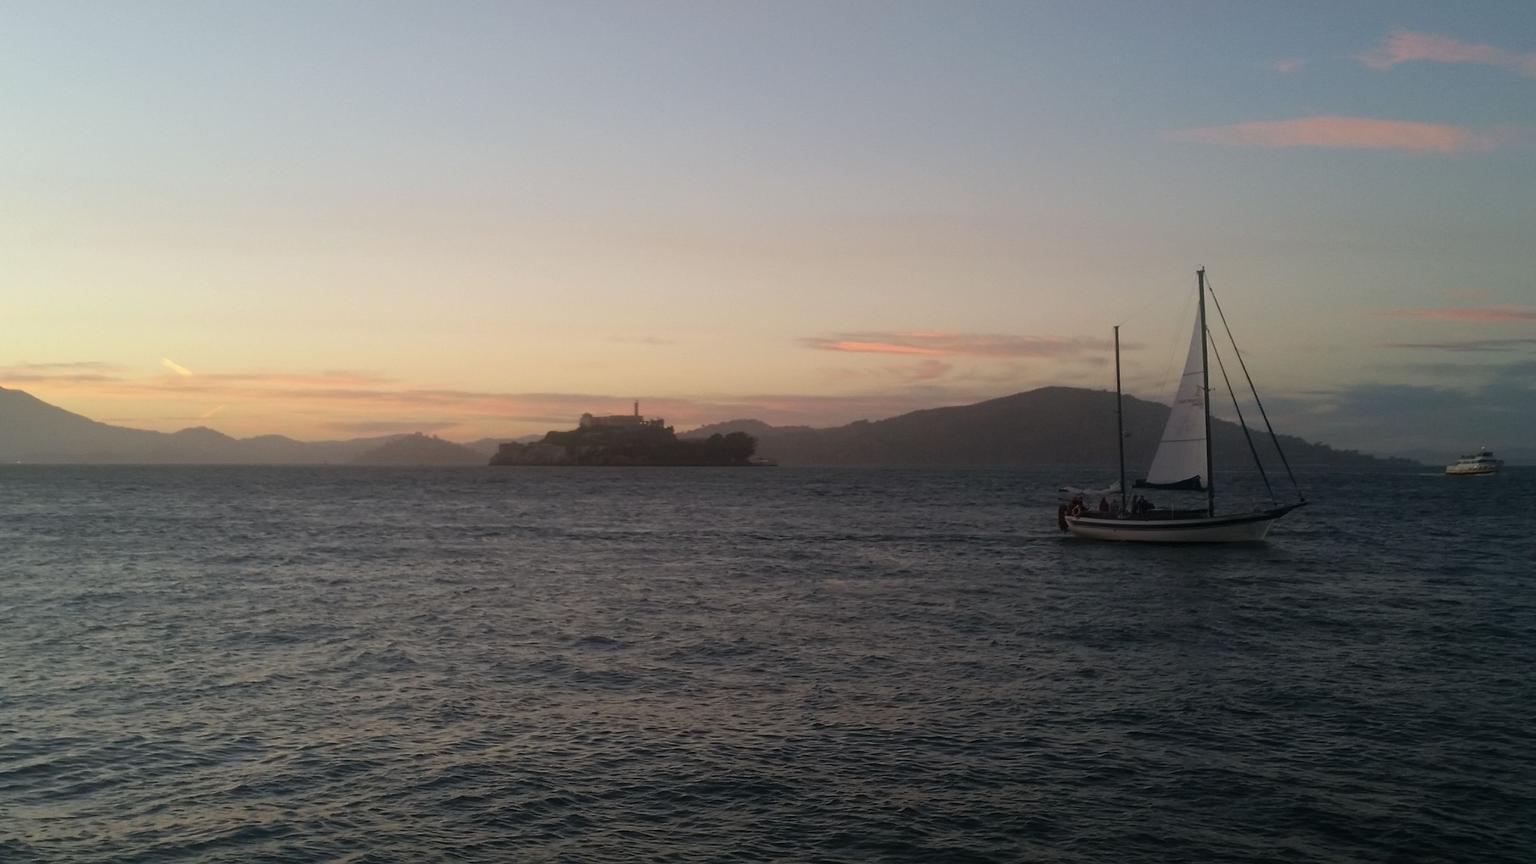 MÁS FOTOS, San Francisco Golden Gate Whale-Watching Tour